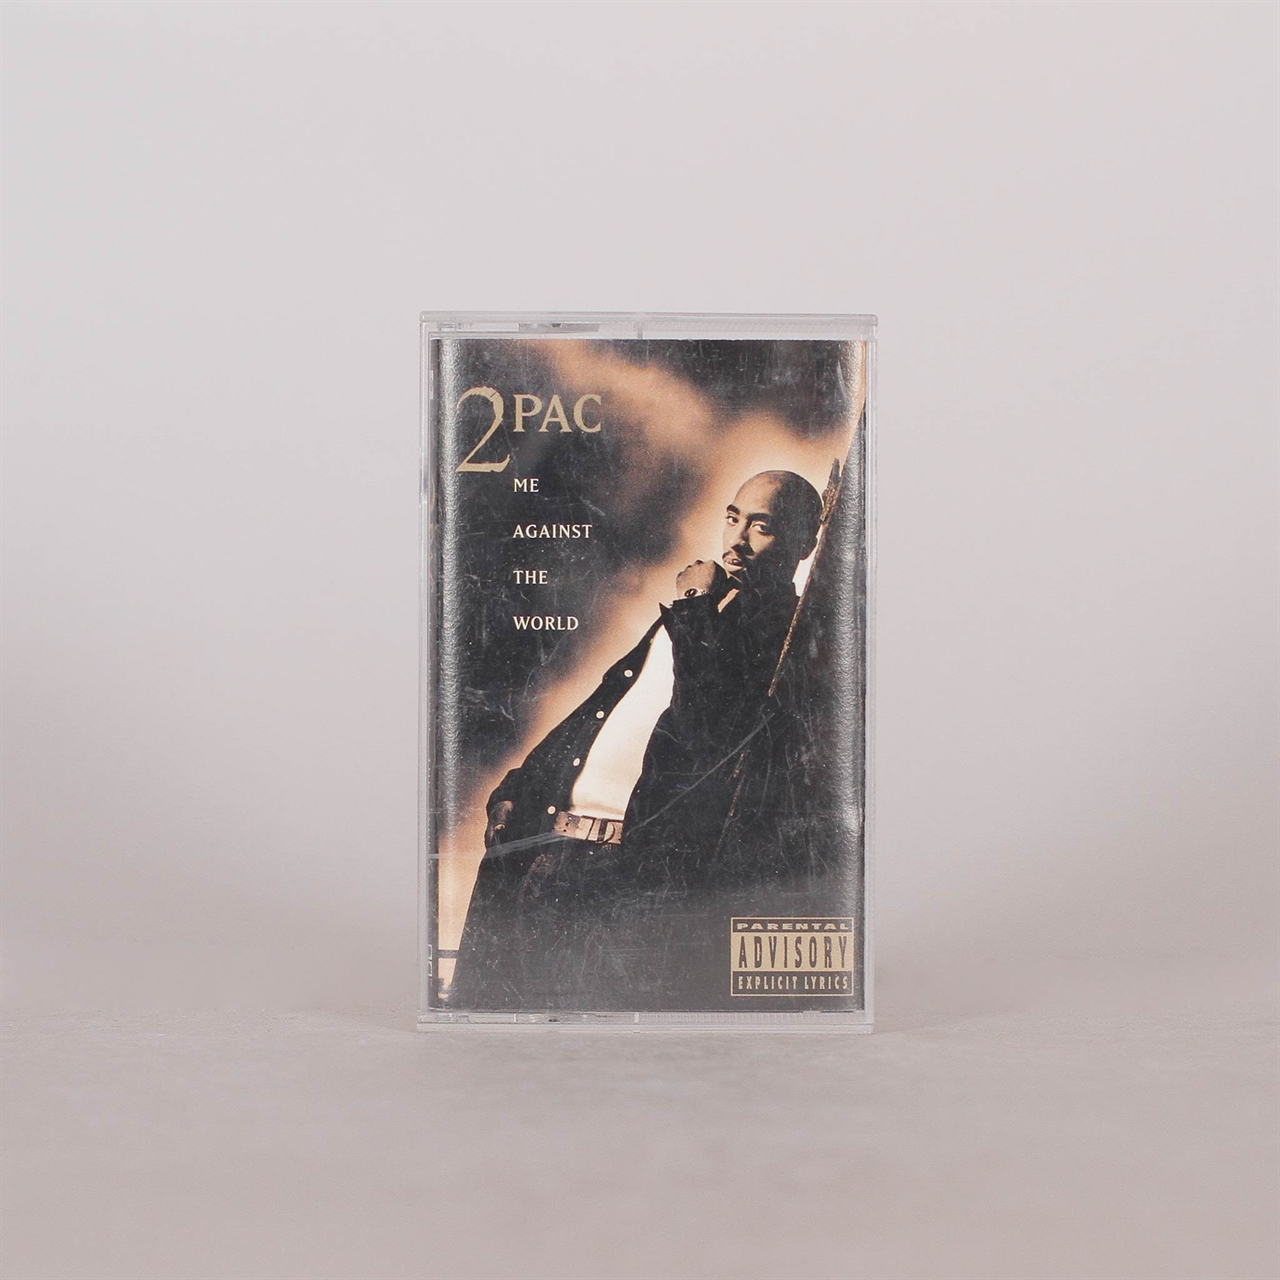 Shelta - 2pac Me Against The World 1995 Cassette (CAS-2PMW)